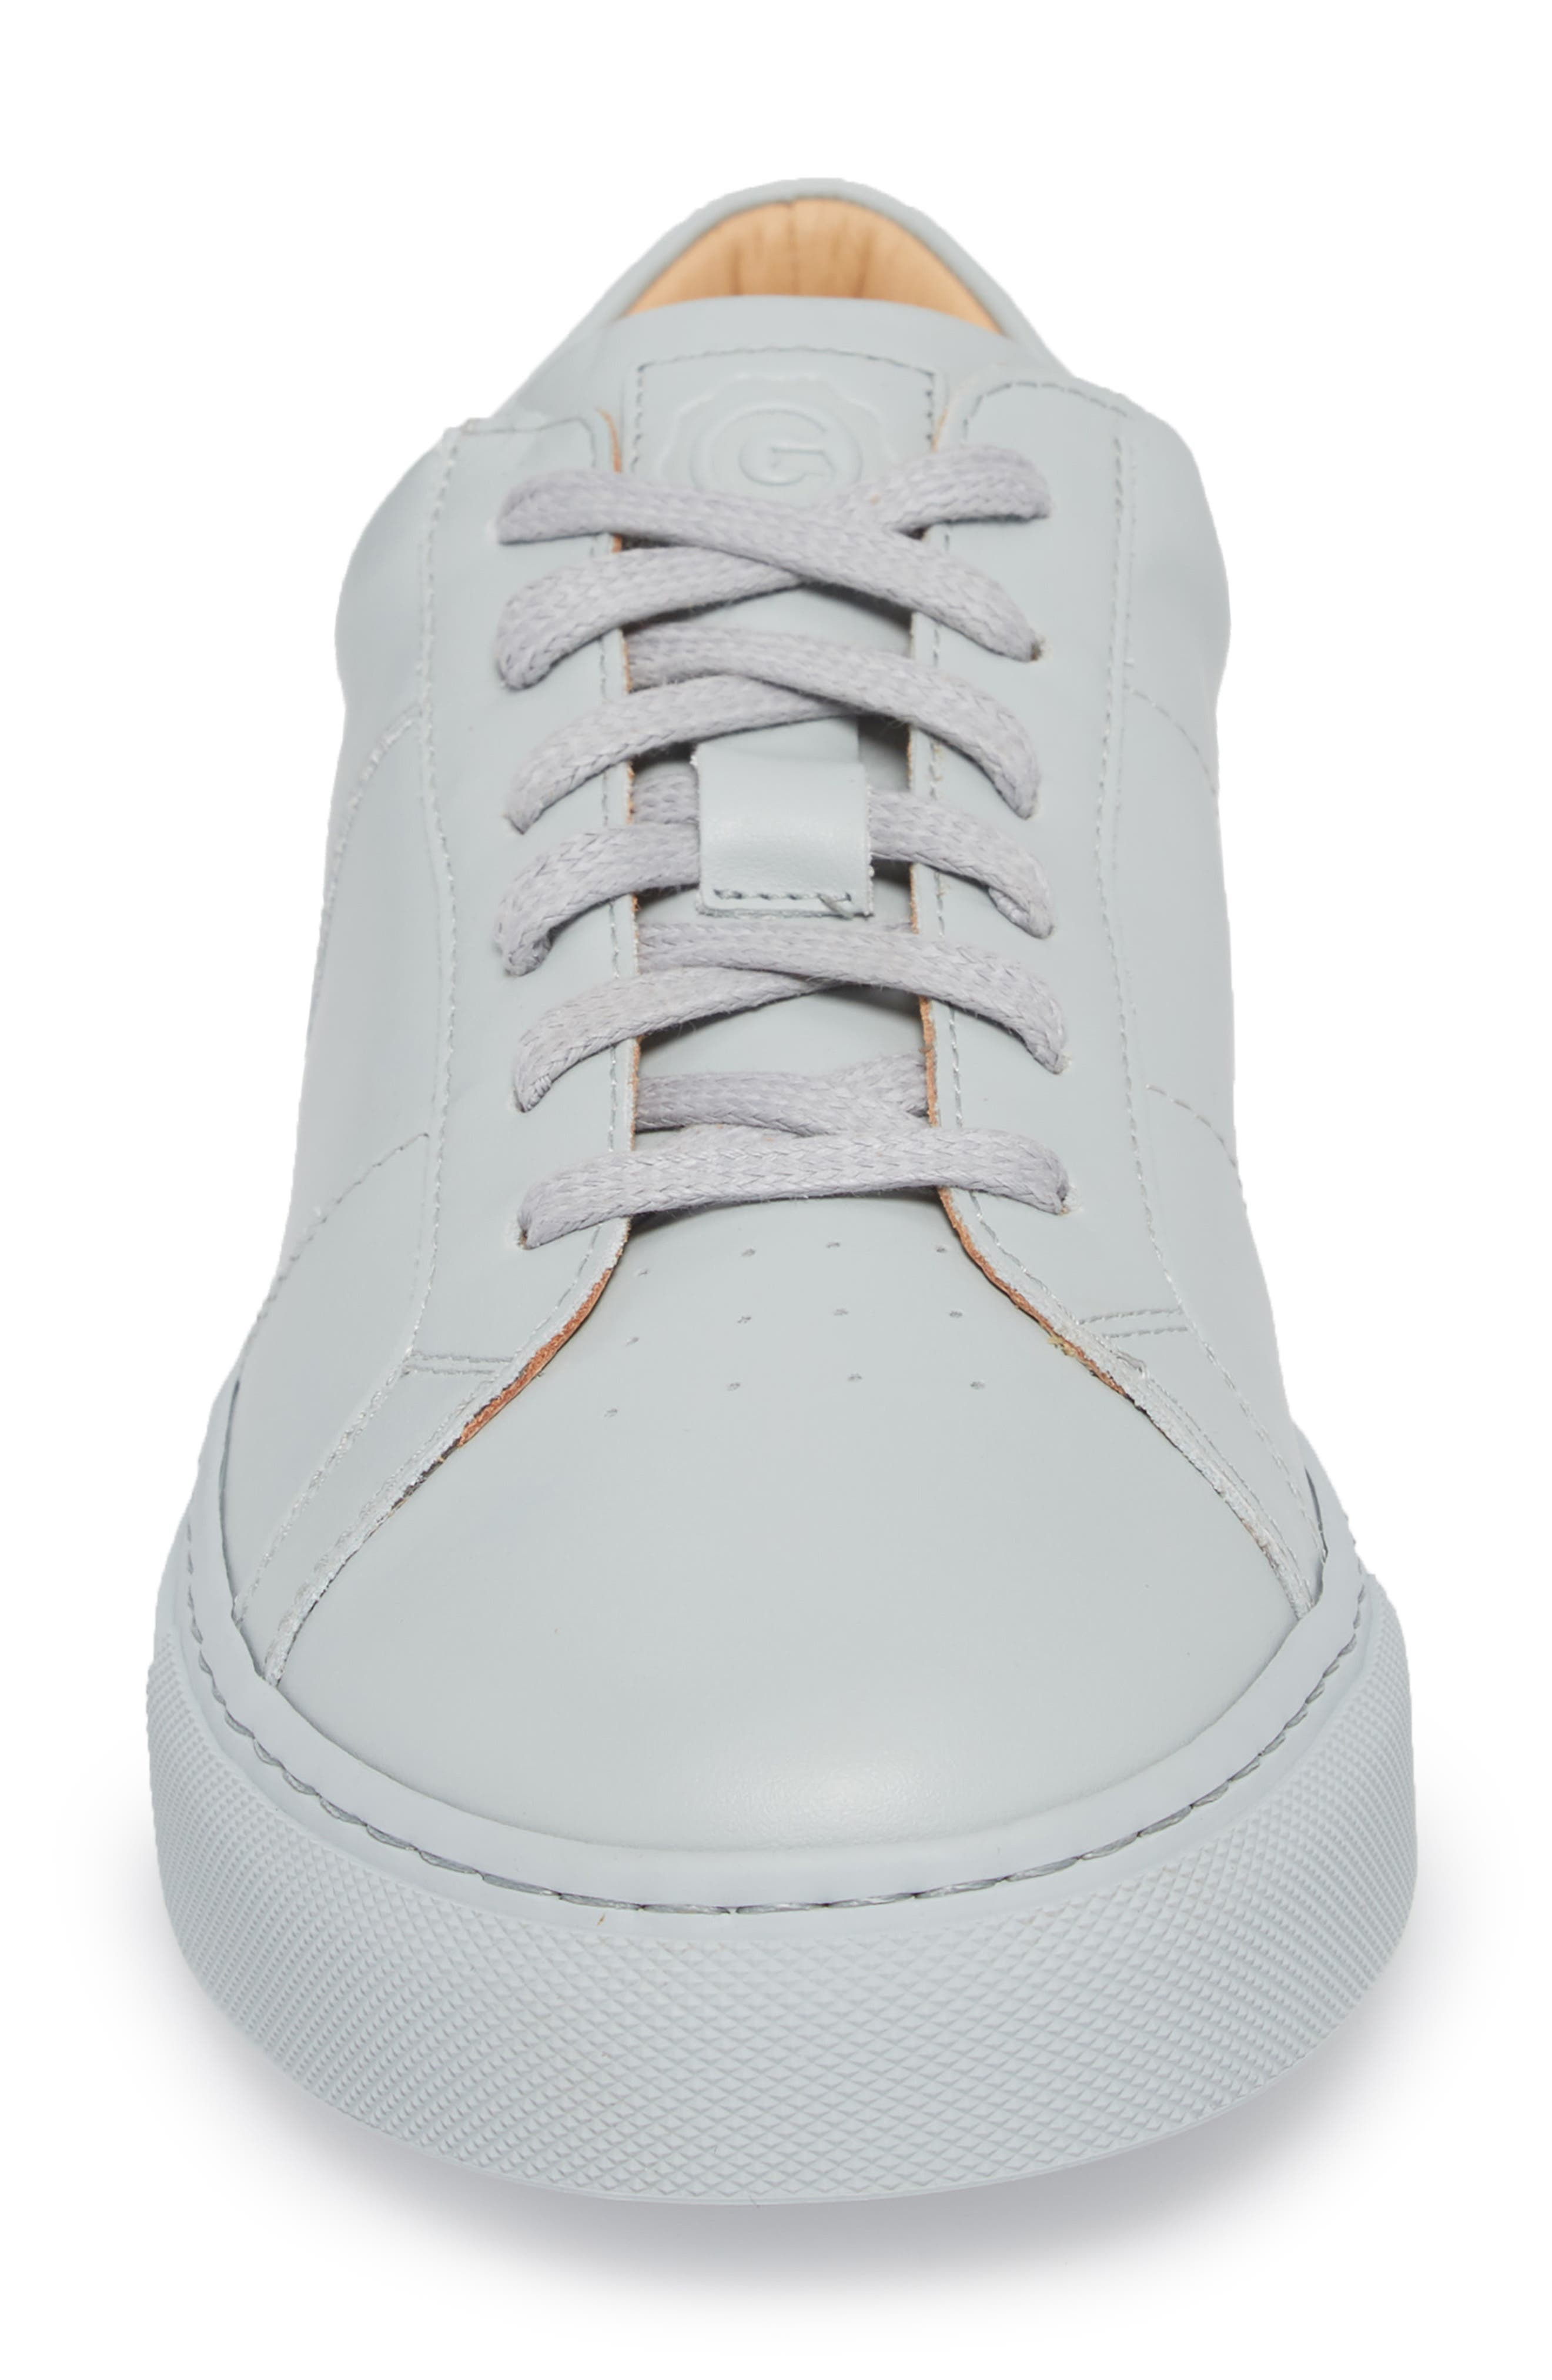 Royale Sneaker,                             Alternate thumbnail 4, color,                             Grey Tonal Leather